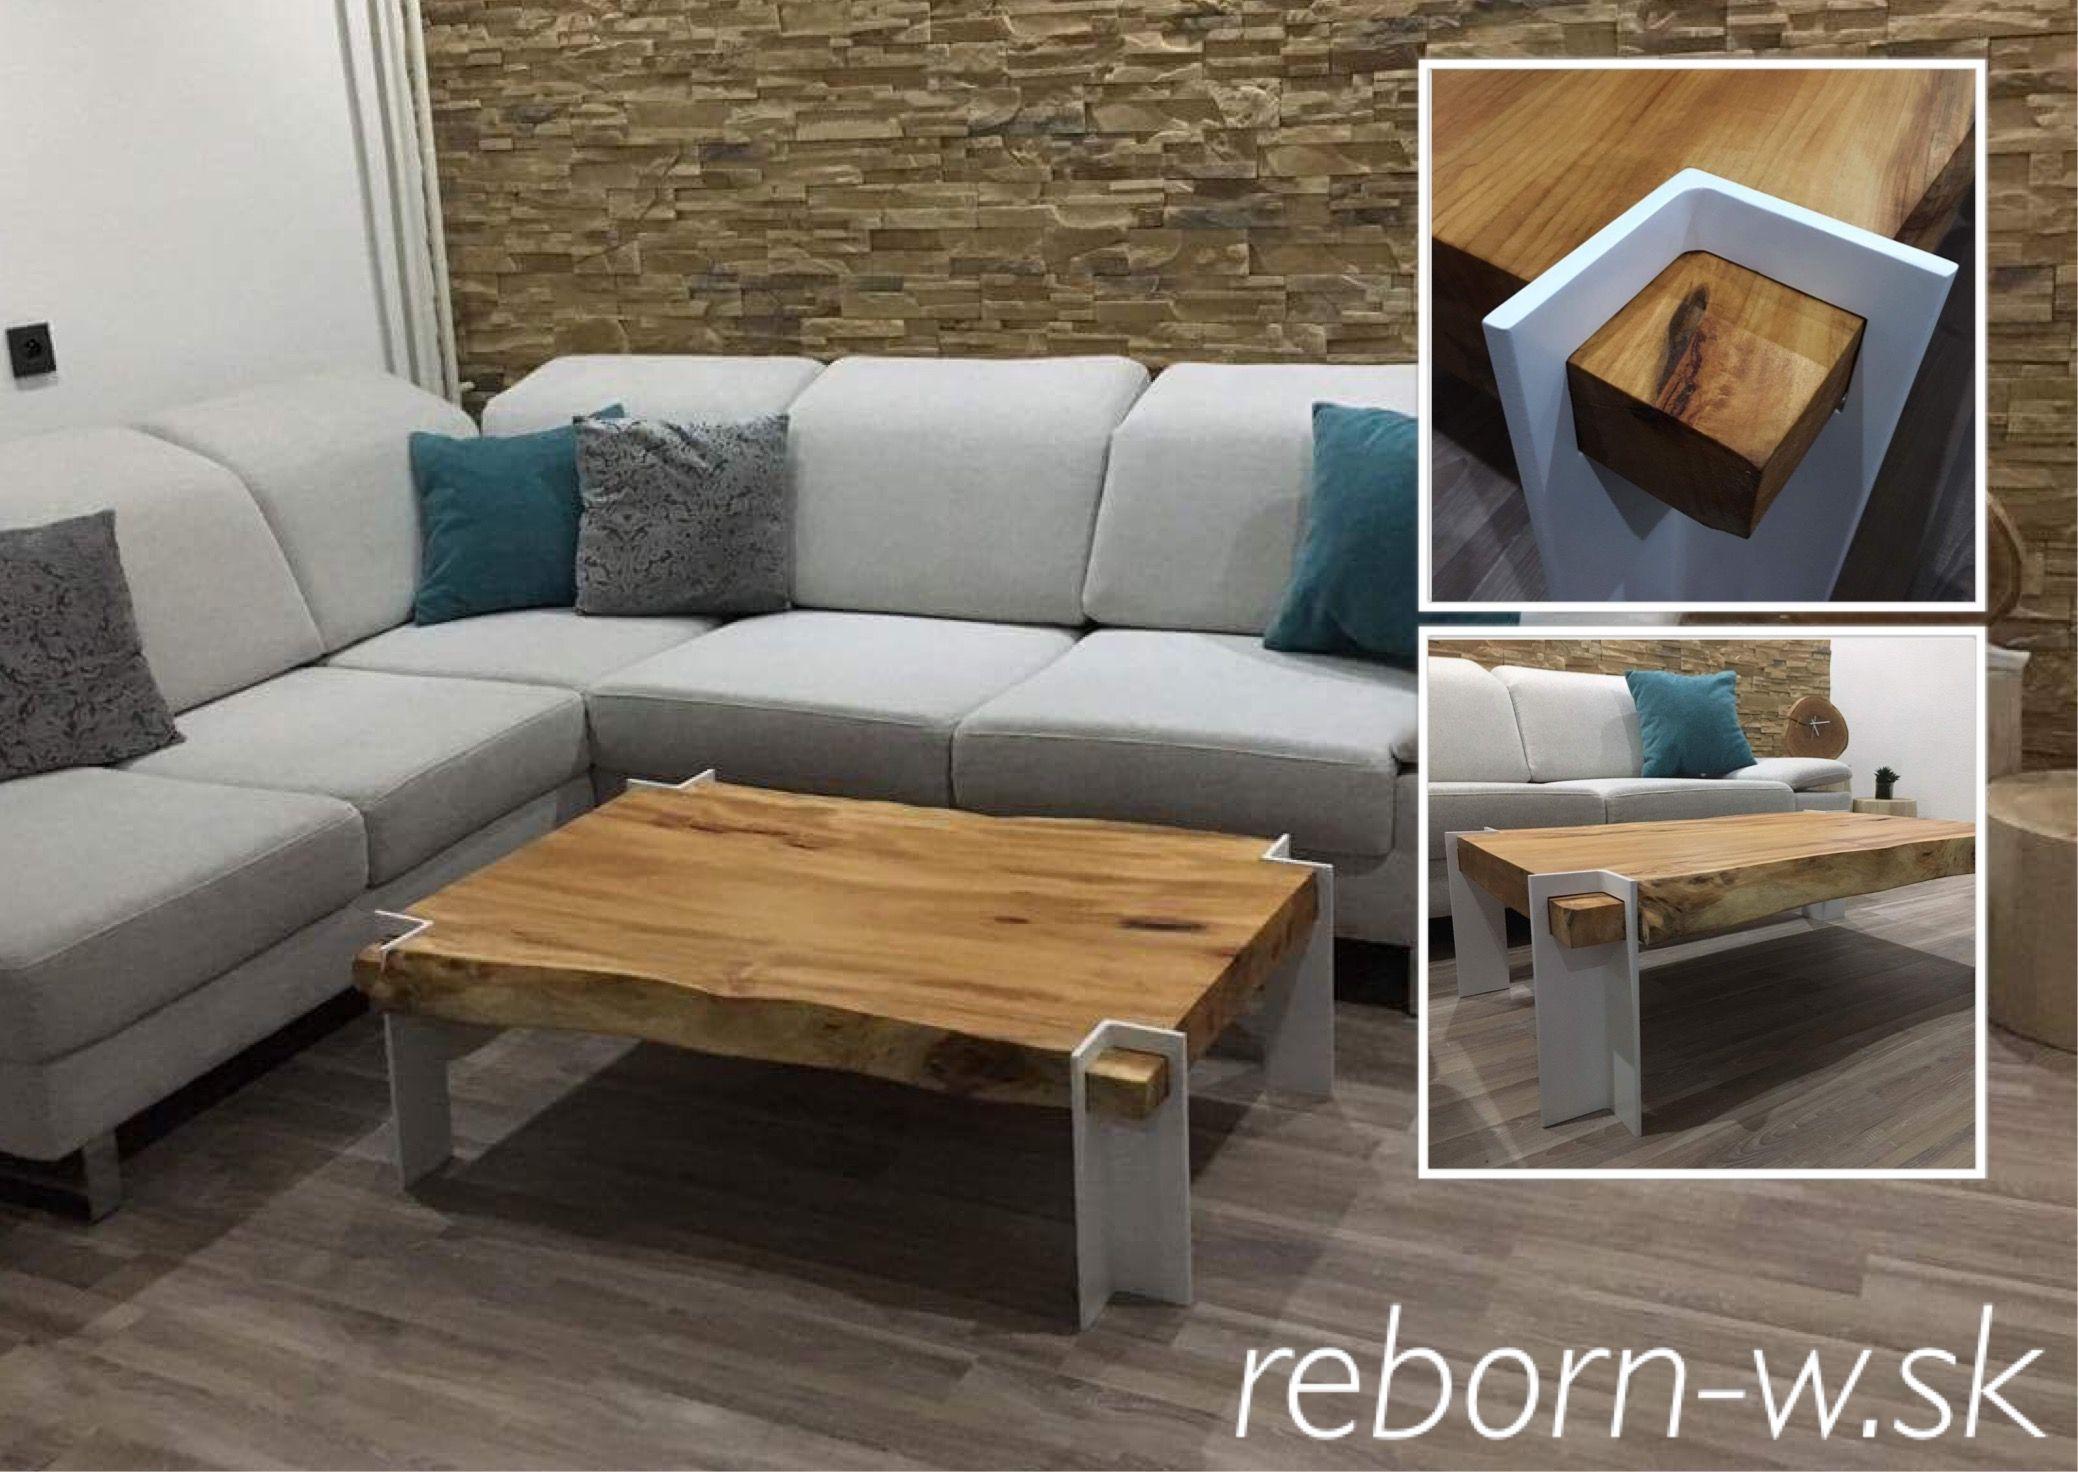 🤗 Ďalšia krásna NOVINKA v ponuke ✔️💚🍃 🔝👍🏼🏡 moderný konferenčný stôl z masívneho dreva 💛💚   🛍👉🏻 kúpite tu: http://reborn-w.sk/sk/konferencne-stoliky/52-konferencny-stolik-acer.html  #welovenature #coffeetable #woodworking #home #design #handmade #solidwood #woodentable #livingroom #modernstyle #natureathome #beoriginal #rebornwsk